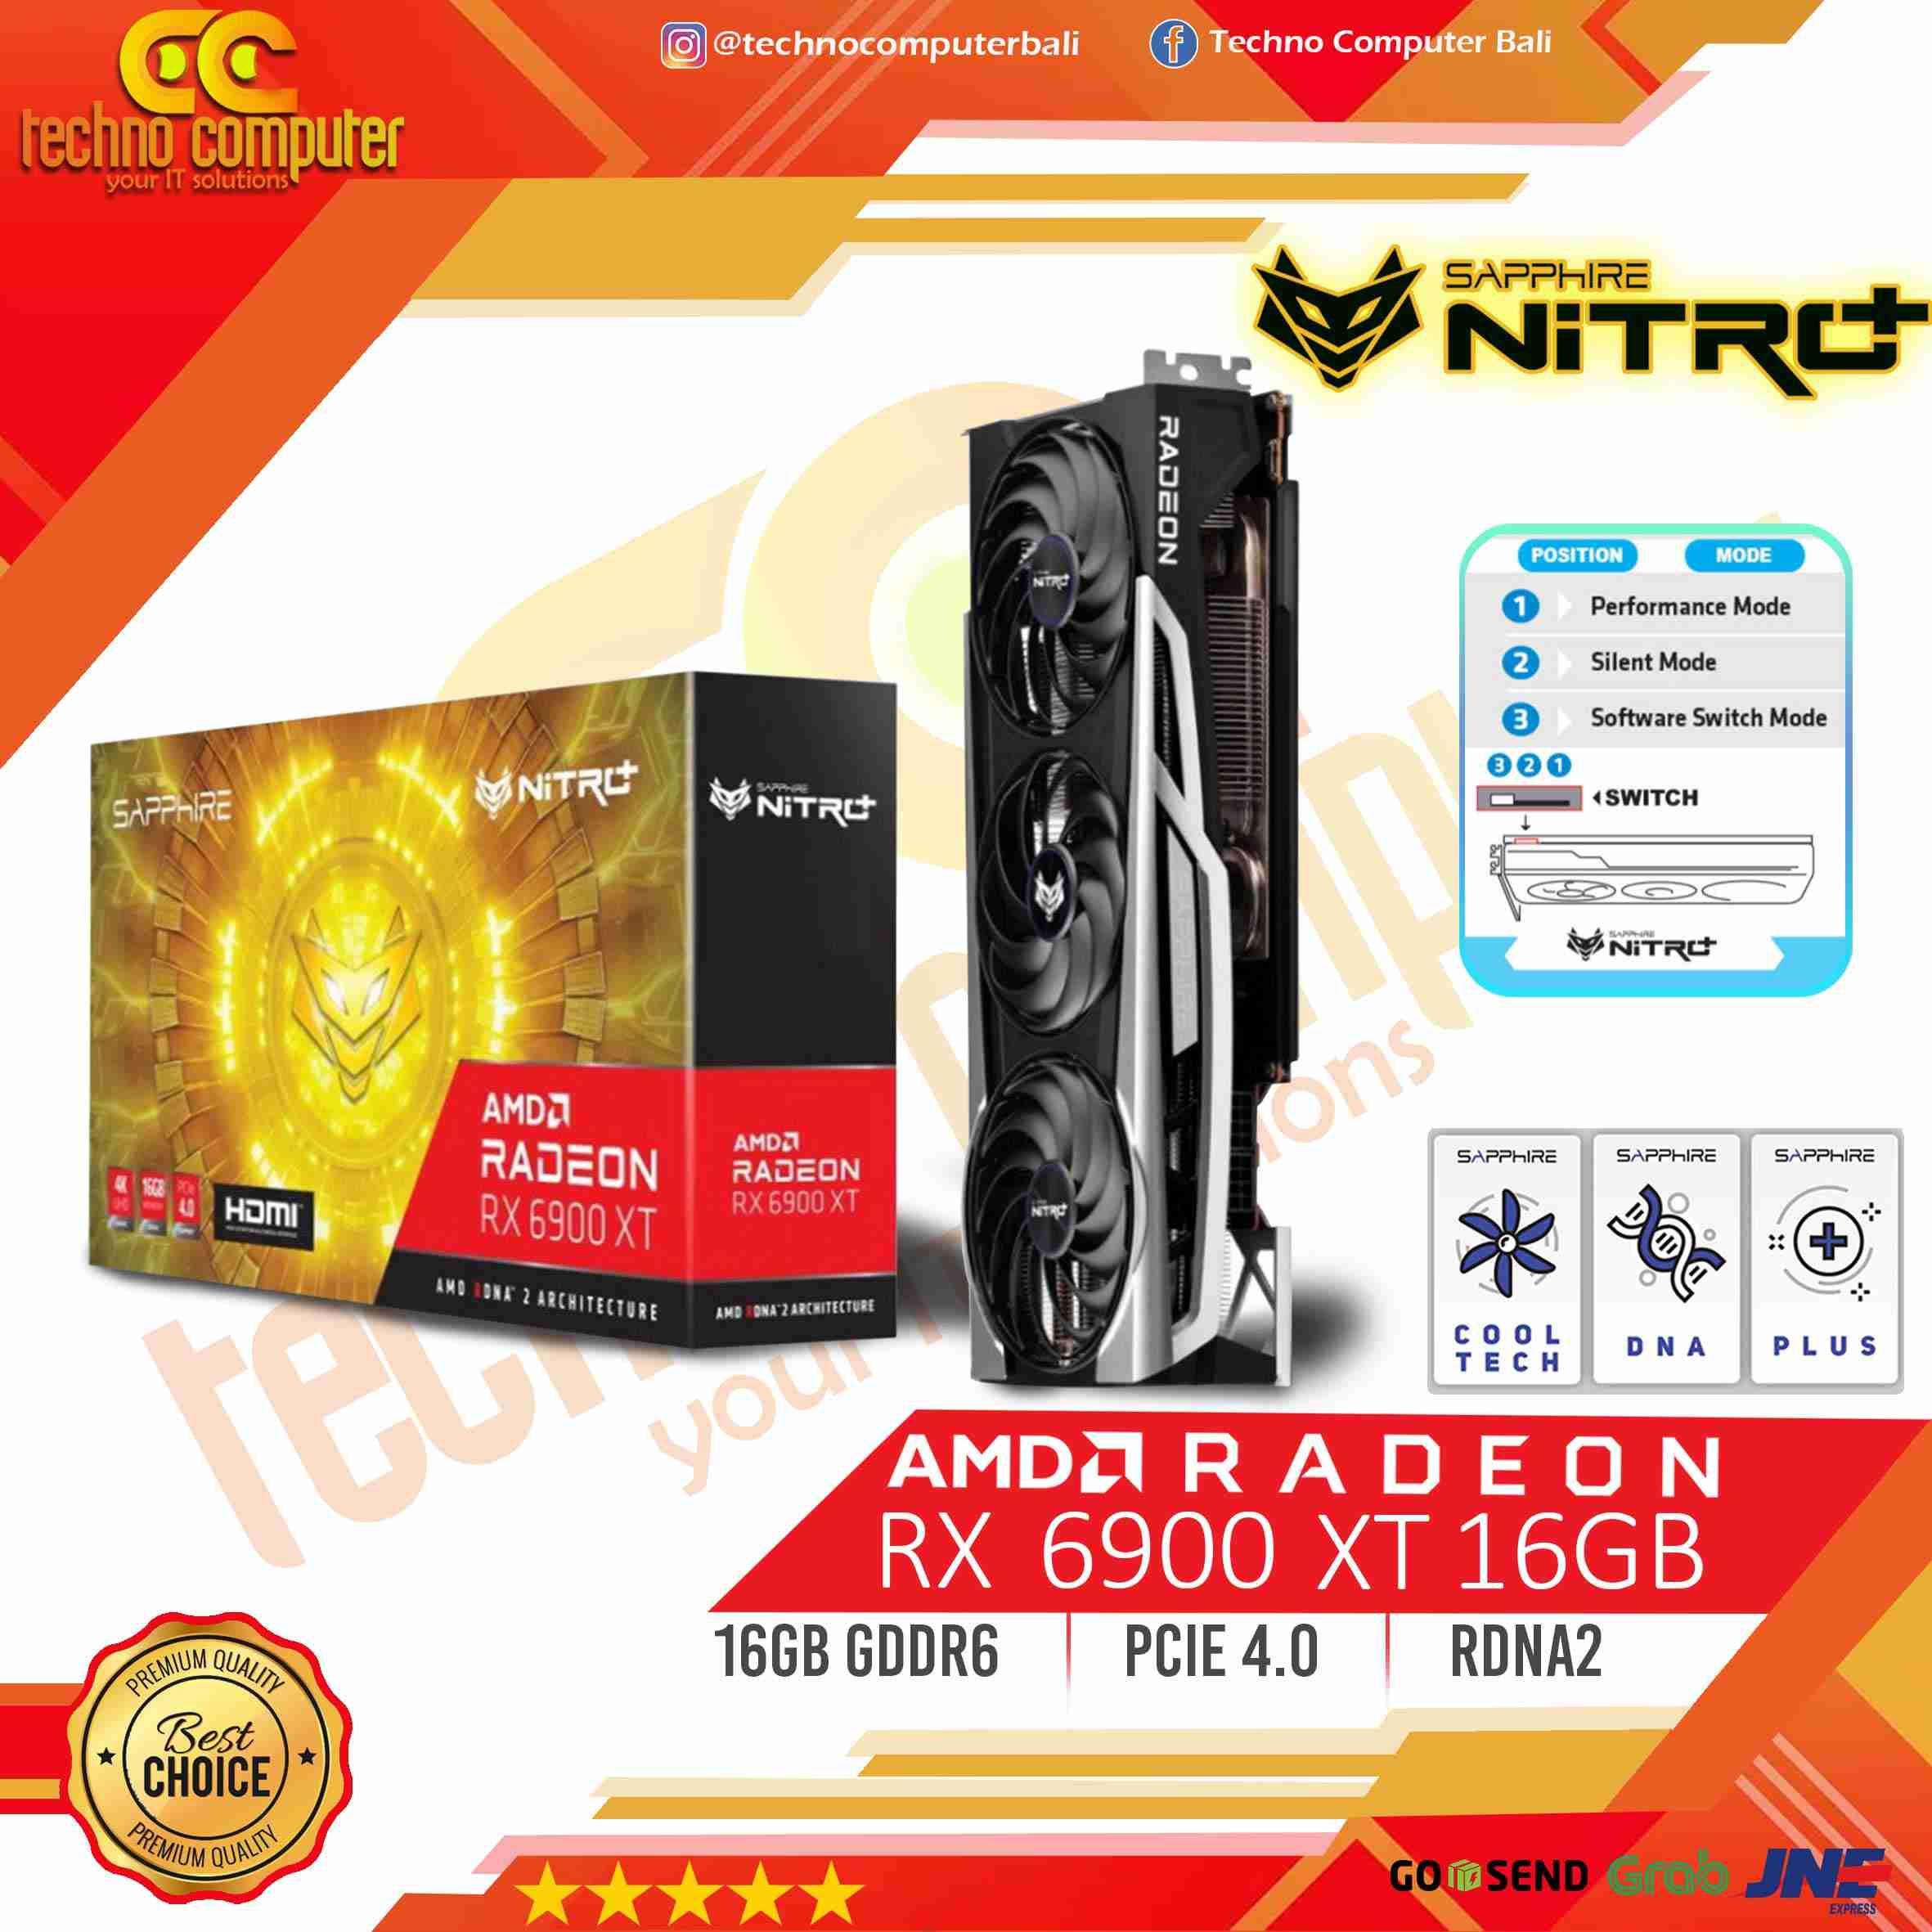 SAPPHIRE NITRO+ AMD RADEON RX 6900 XT 16GB GDDR6, AMD RDNA 2